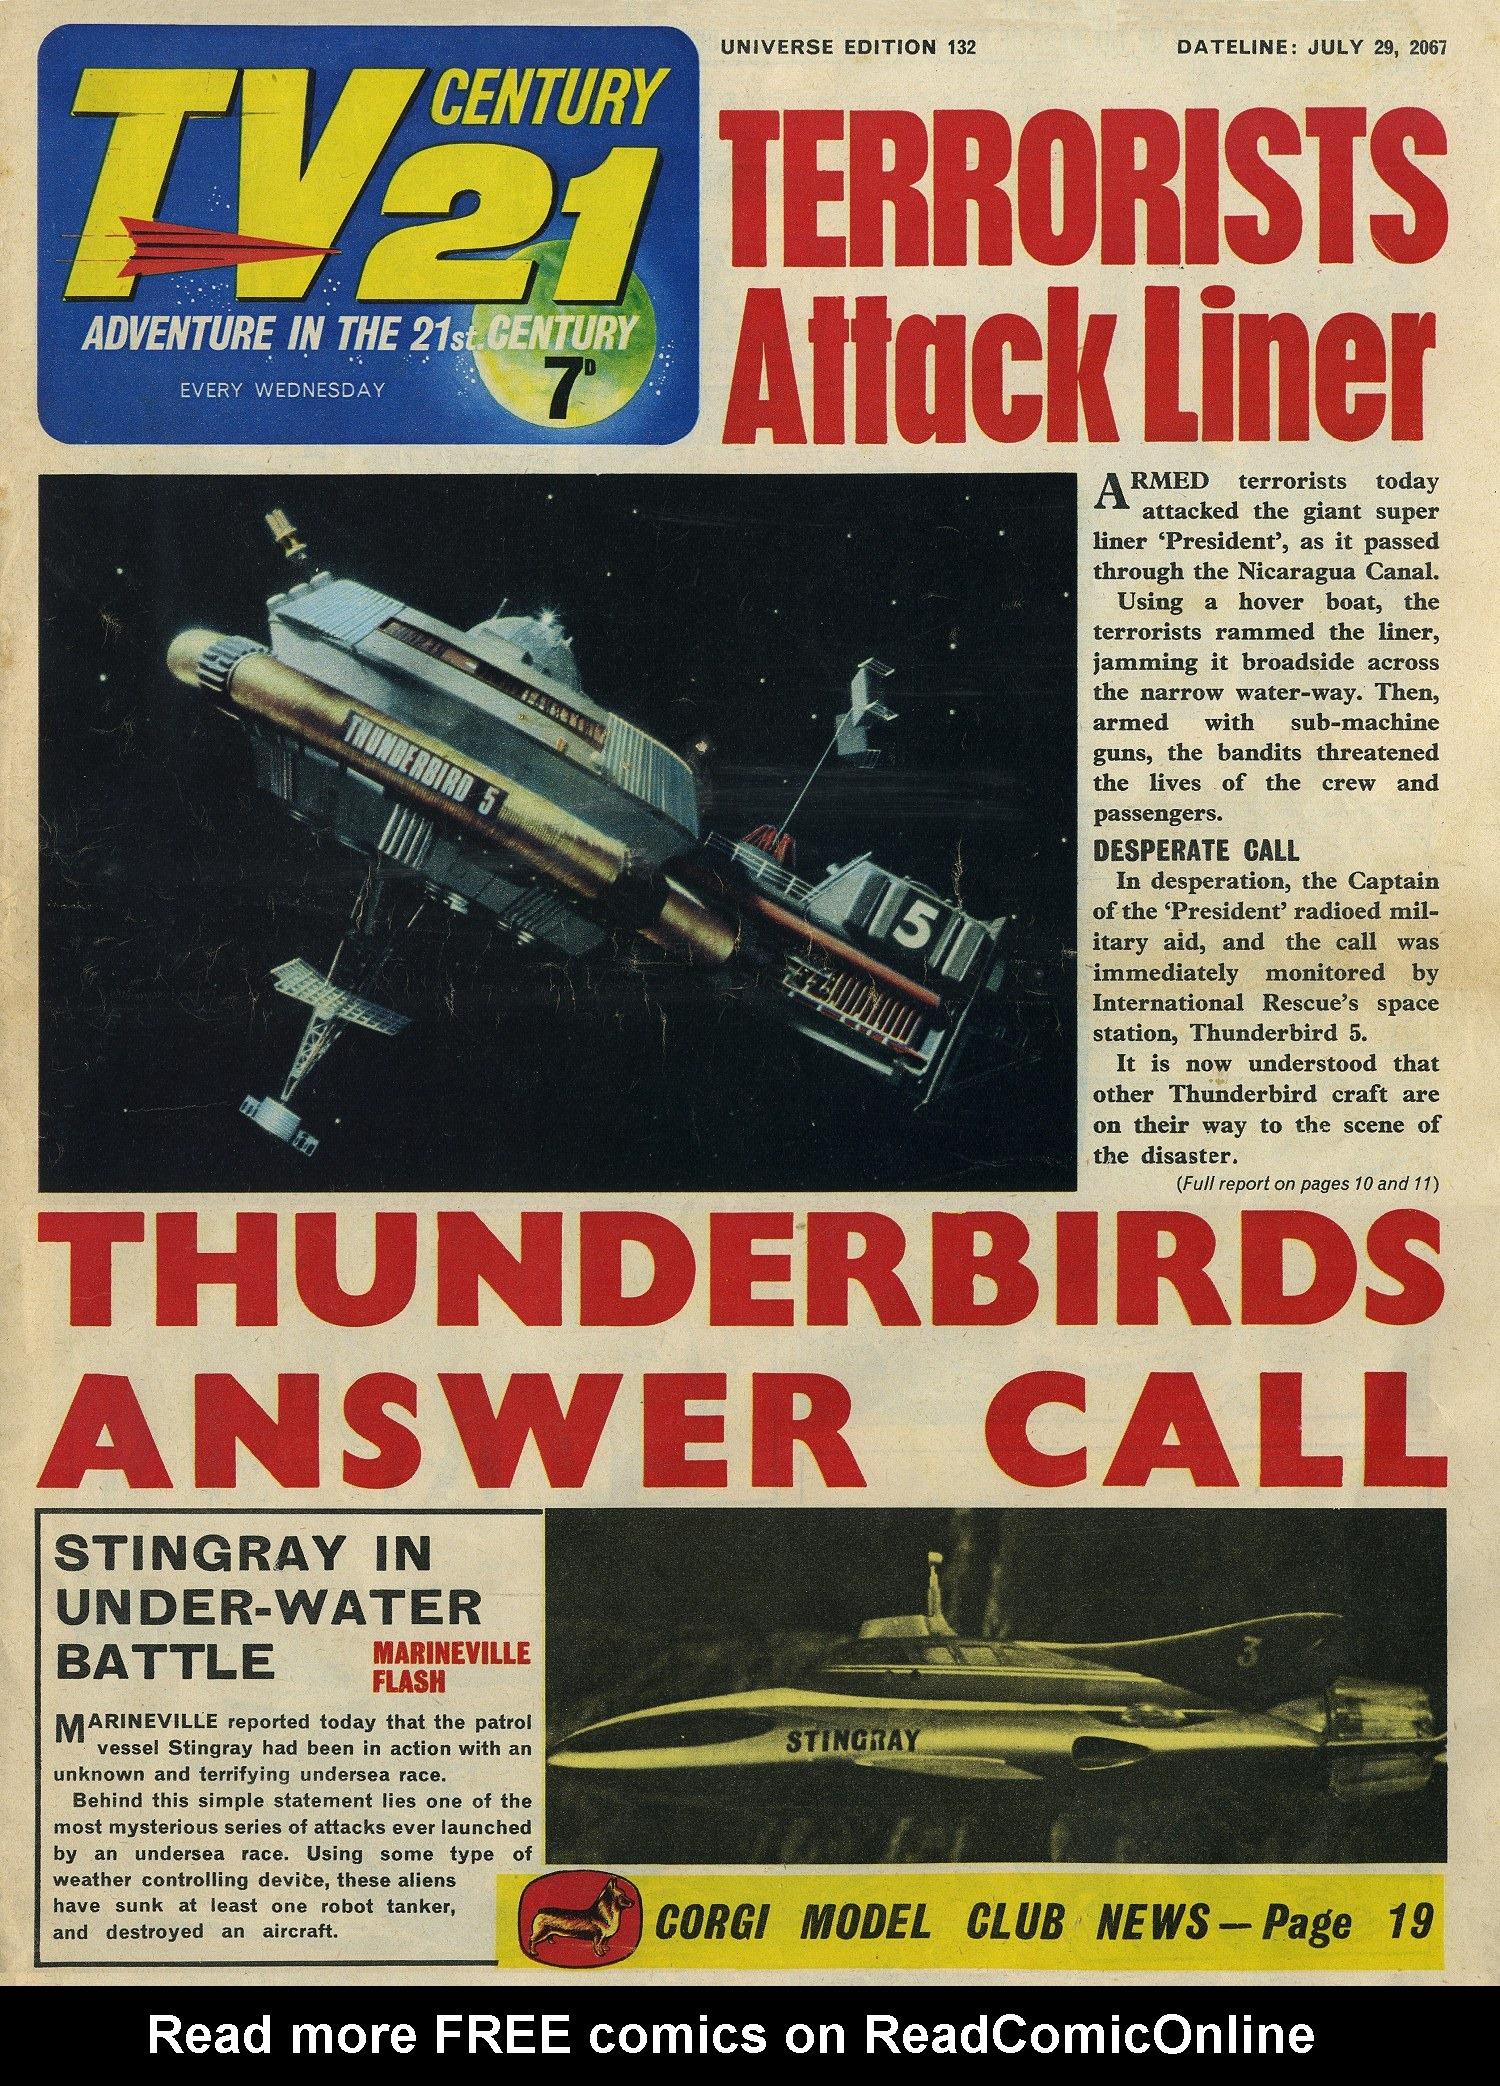 Read online TV Century 21 (TV 21) comic -  Issue #132 - 1